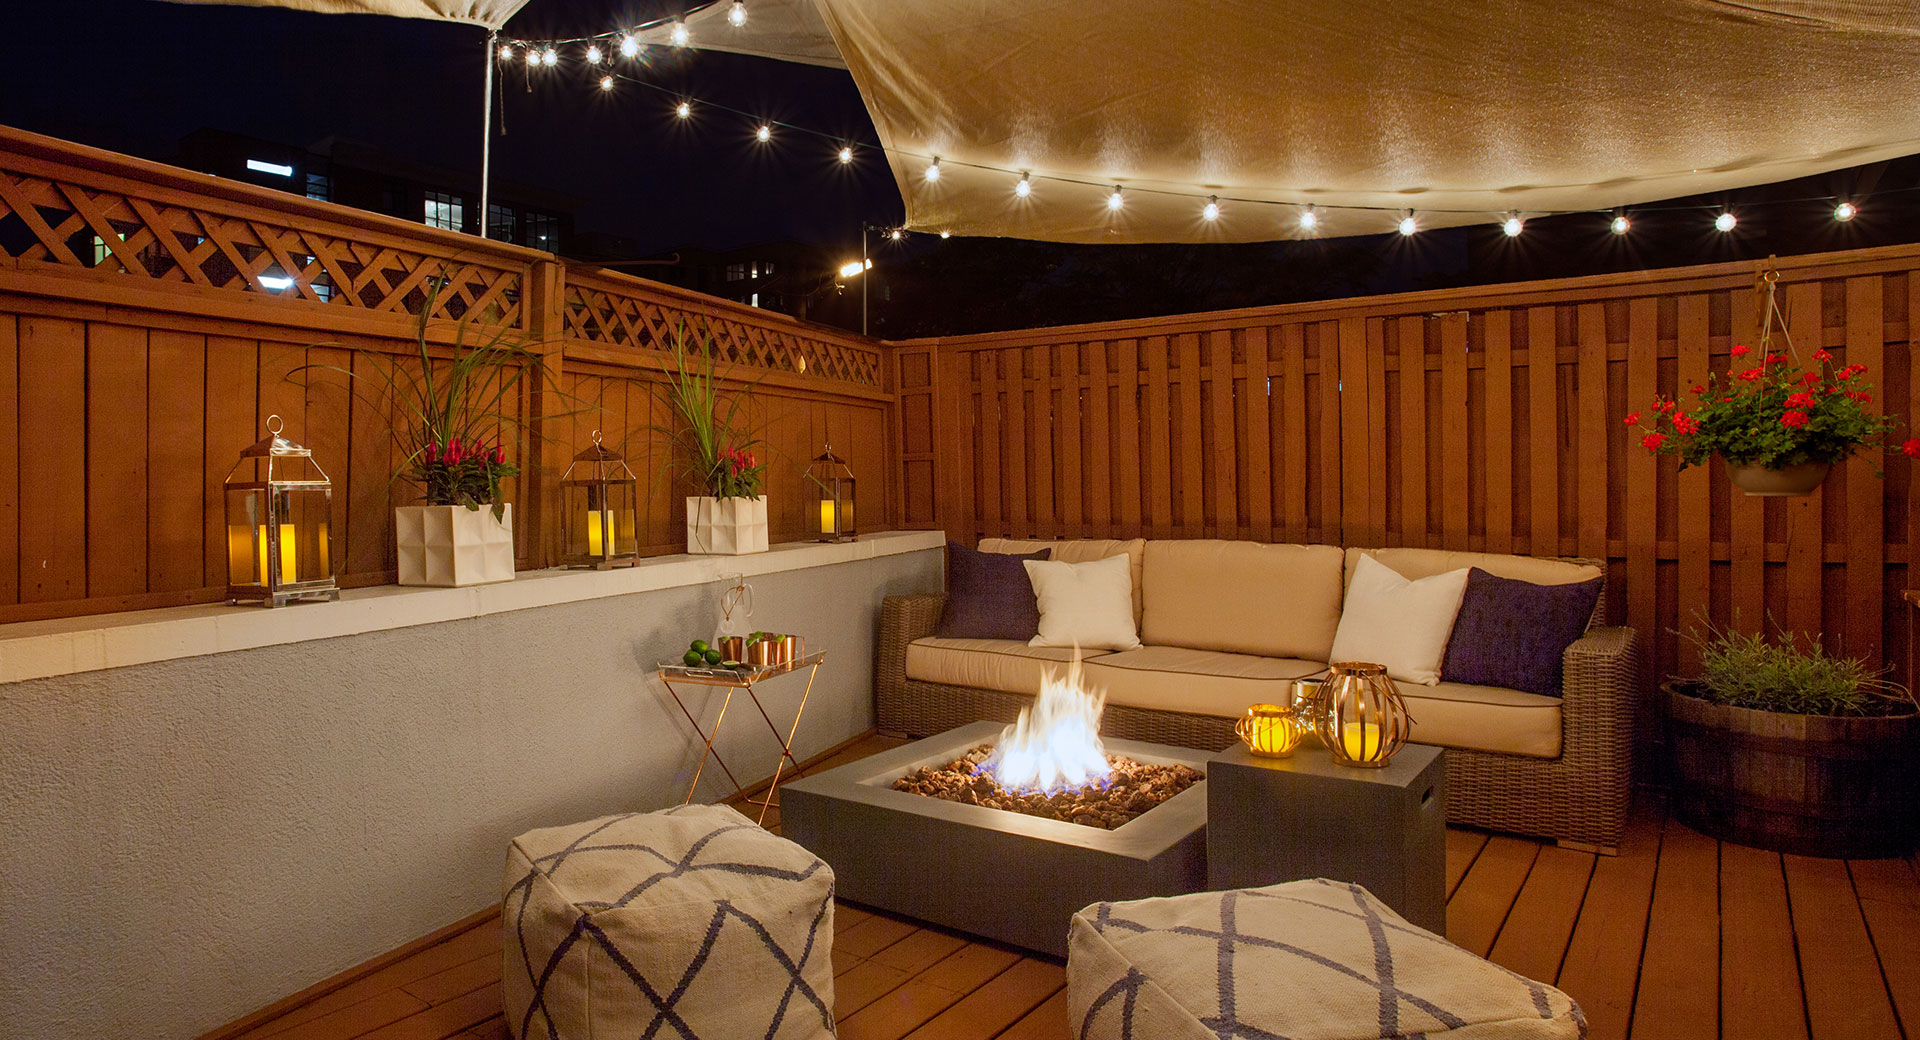 Deck Backyard Remodel Ideas